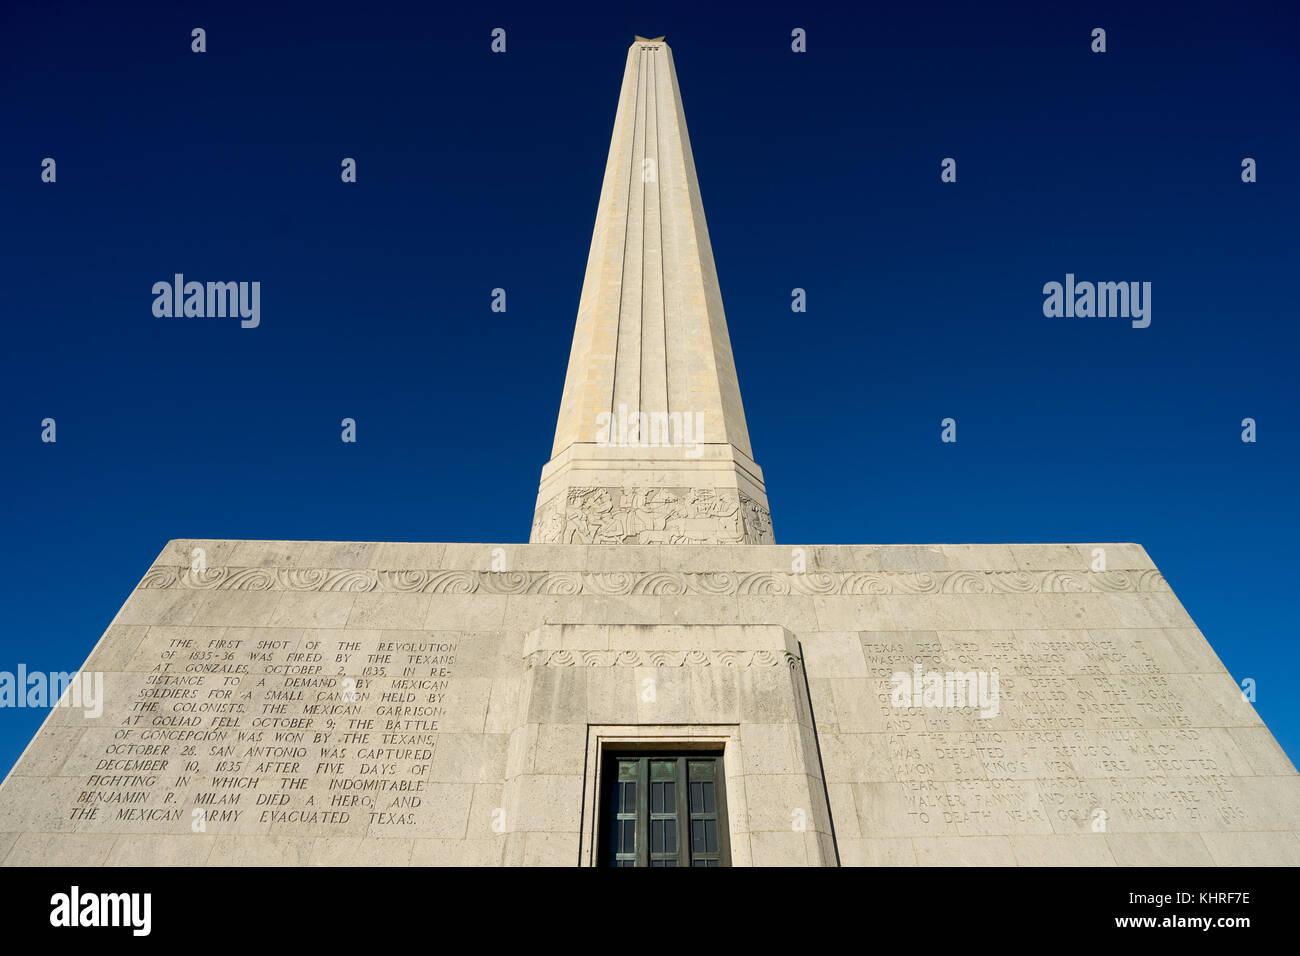 San Jacinto battleground monument Houston Texas - Stock Image